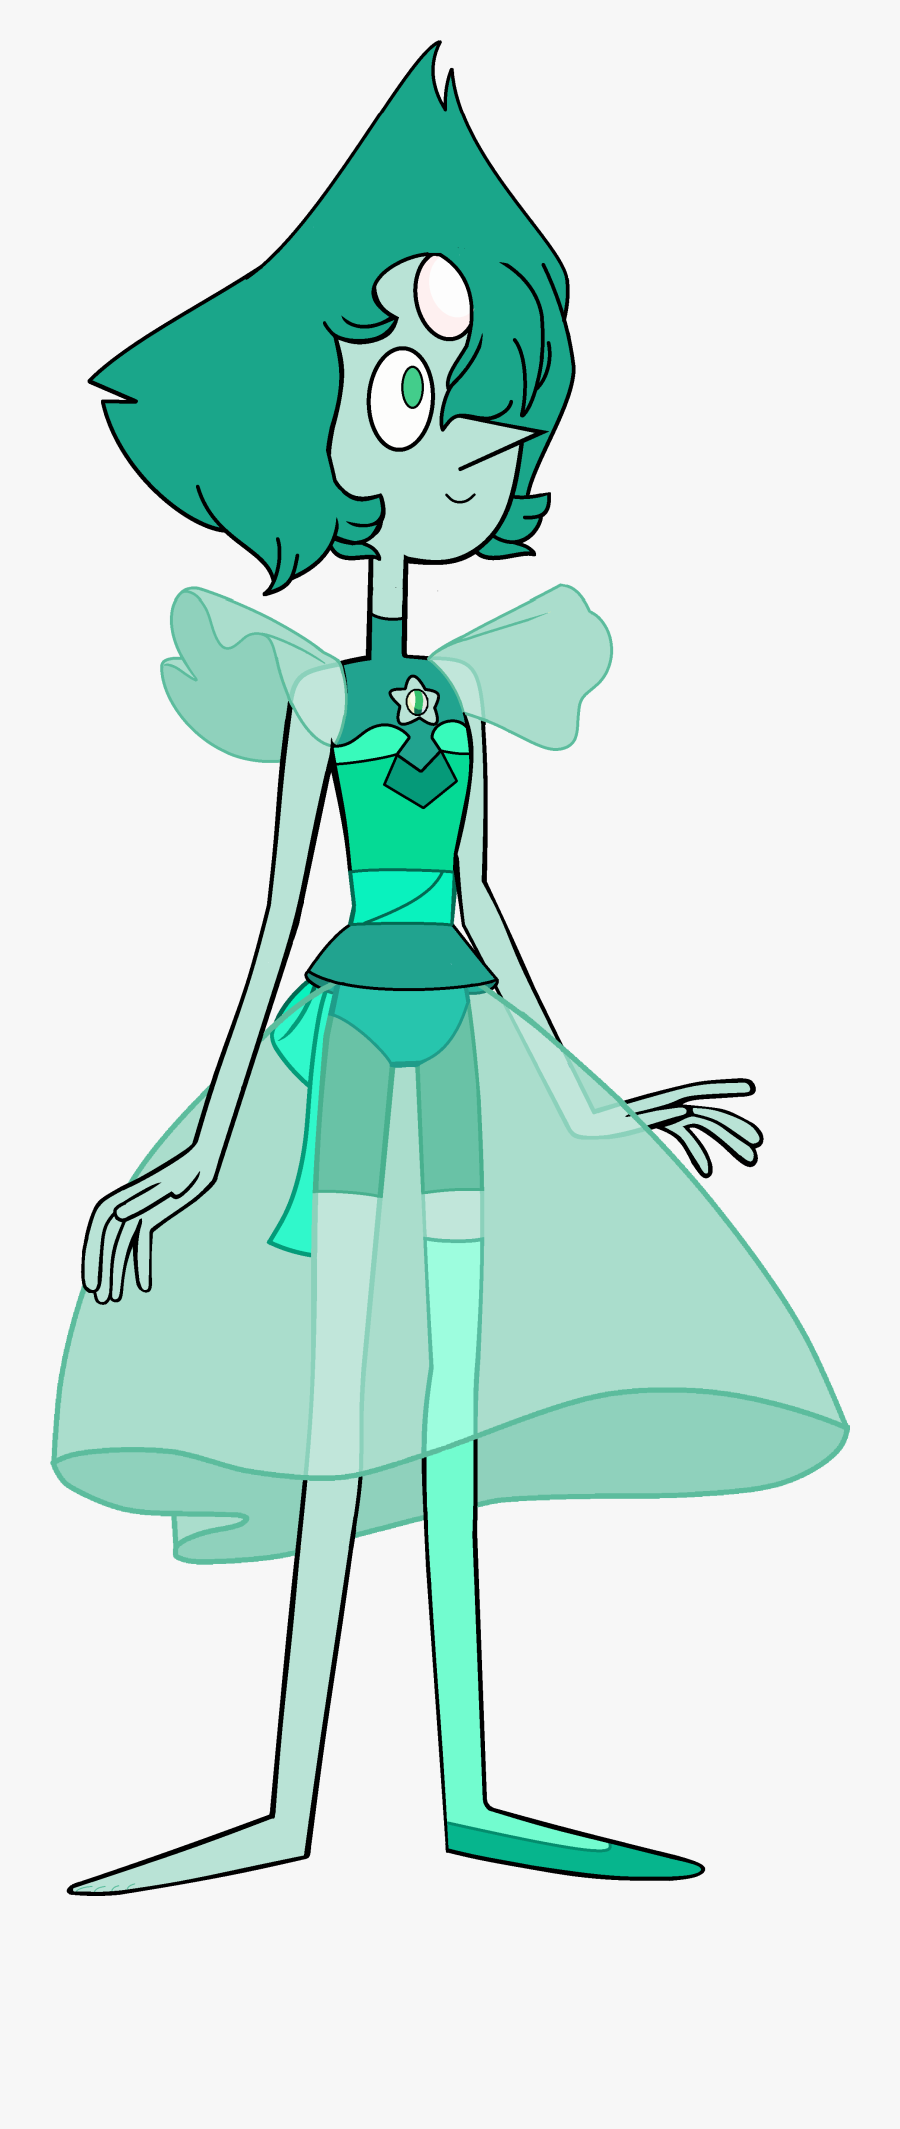 Transparent Pearl Clipart - Steven Universe All Pearls Fusion, Transparent Clipart